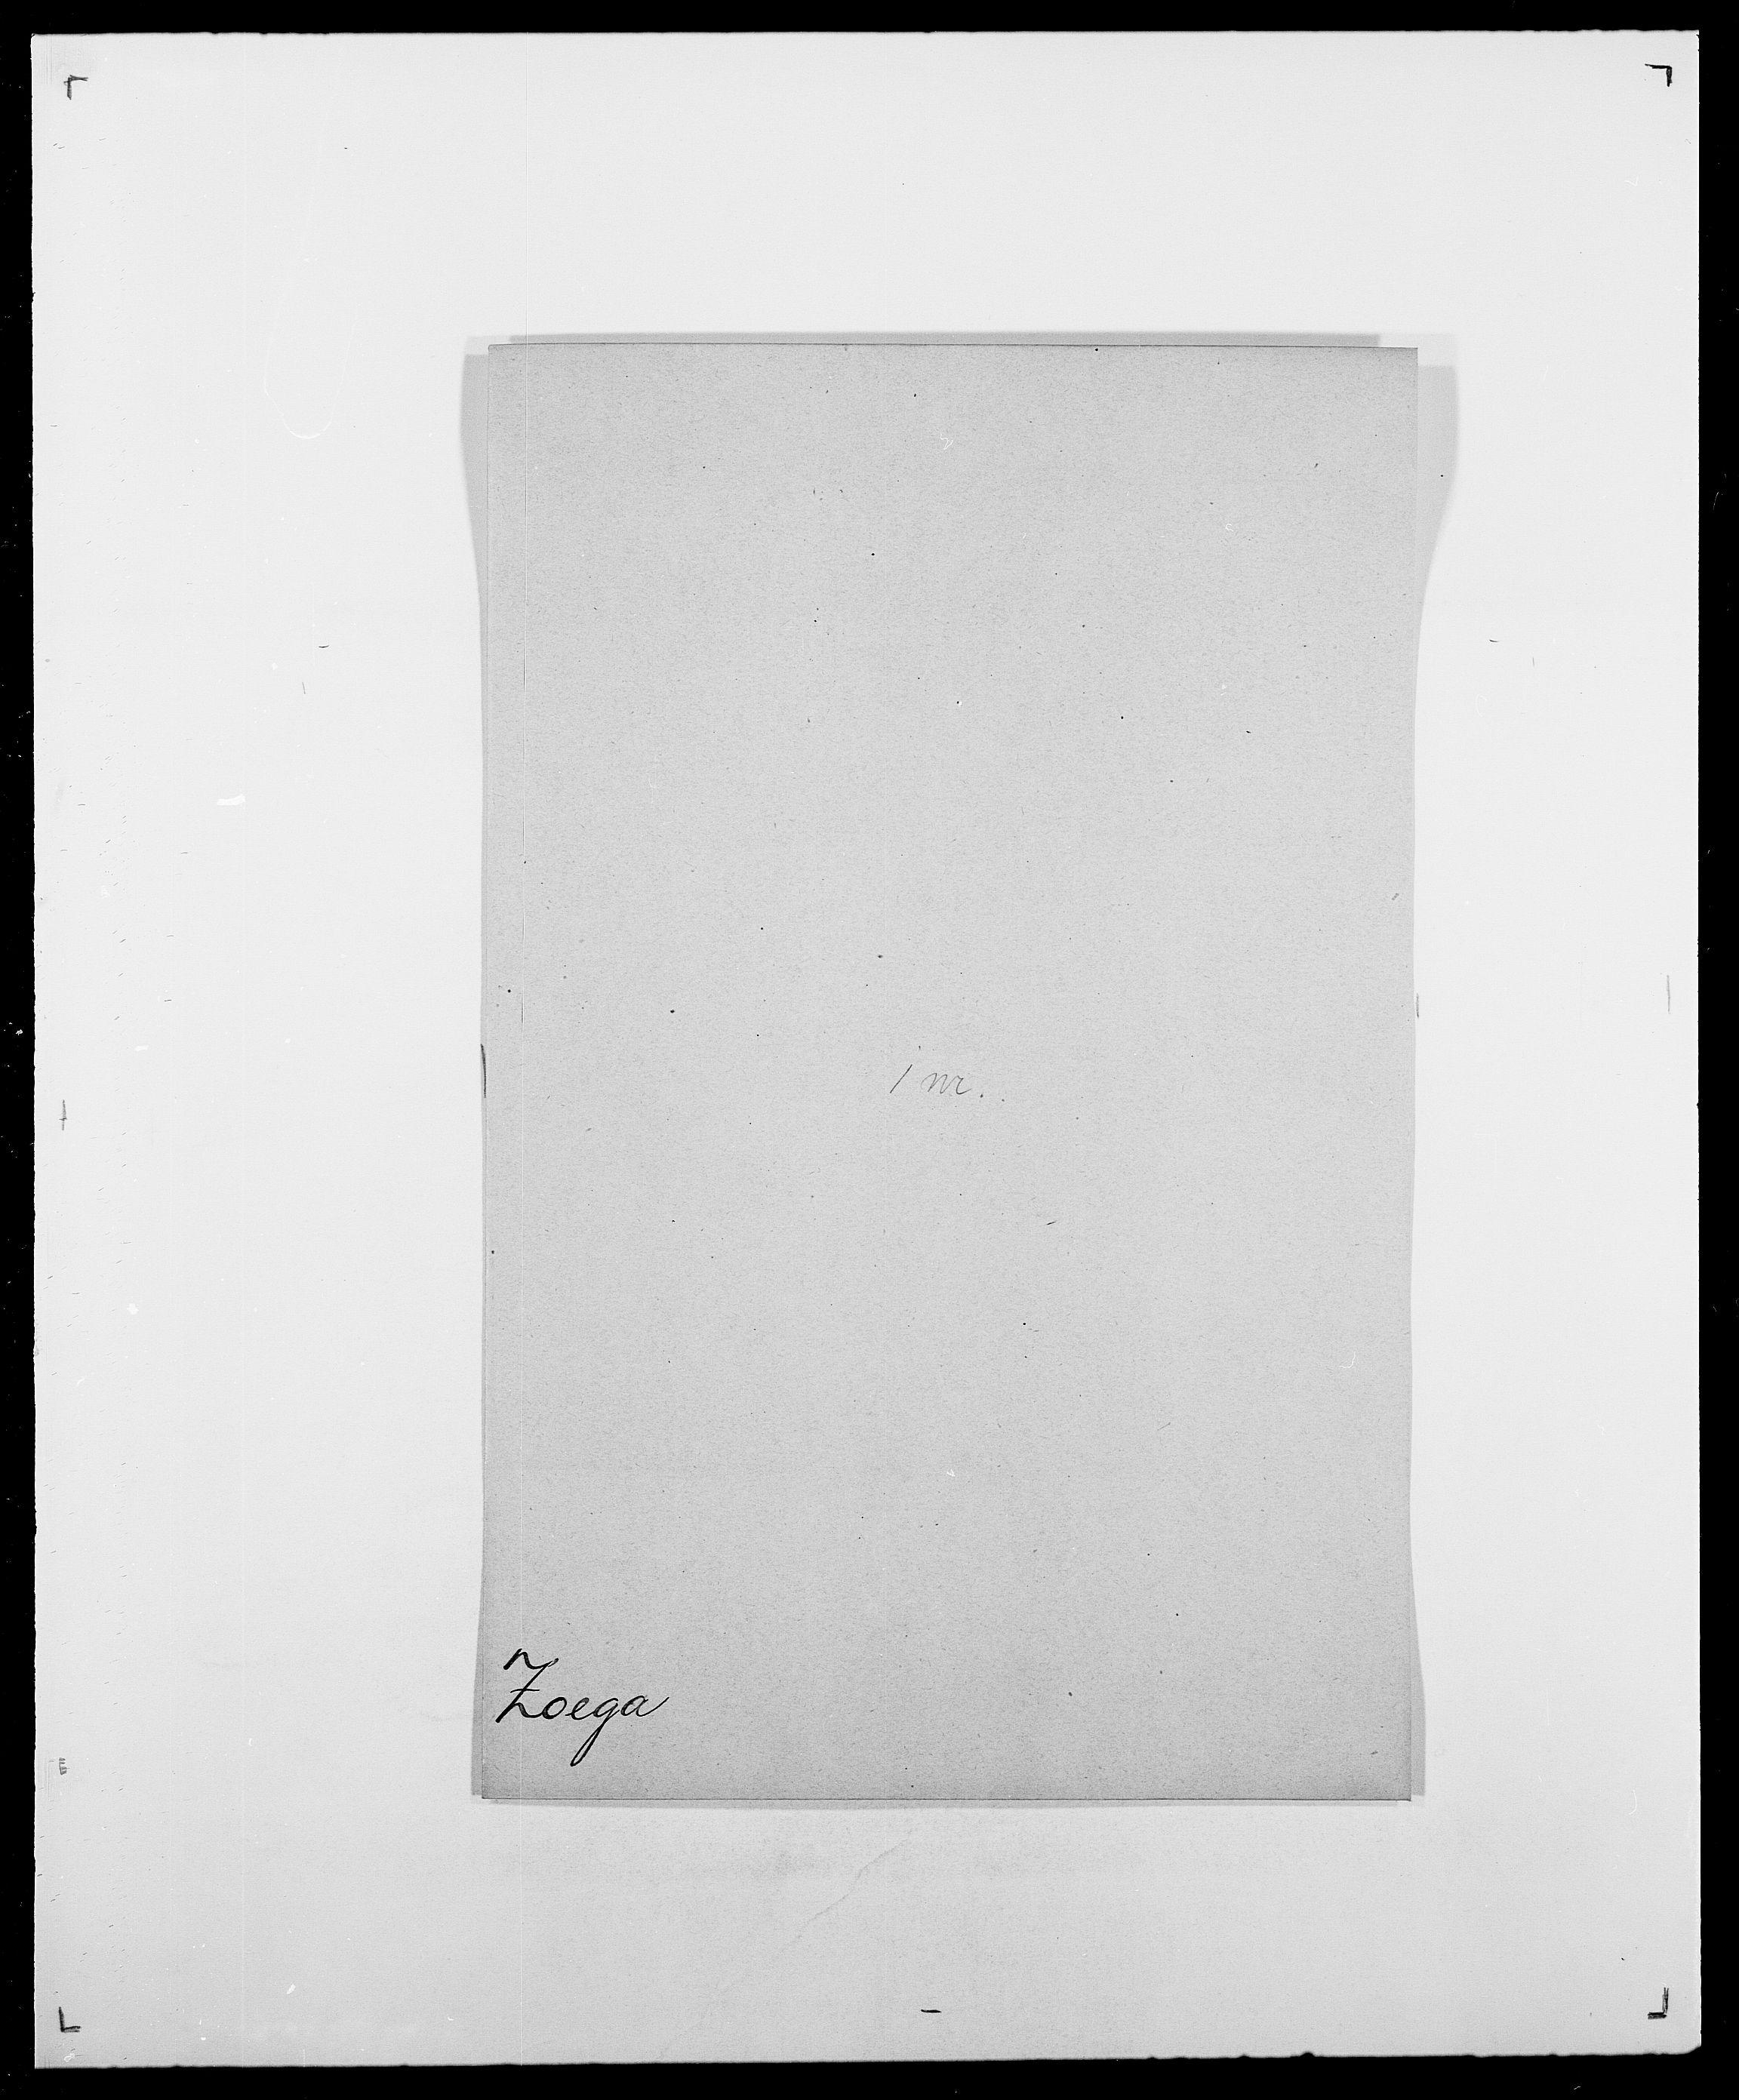 SAO, Delgobe, Charles Antoine - samling, D/Da/L0043: Wulfsberg - v. Zanten, s. 202